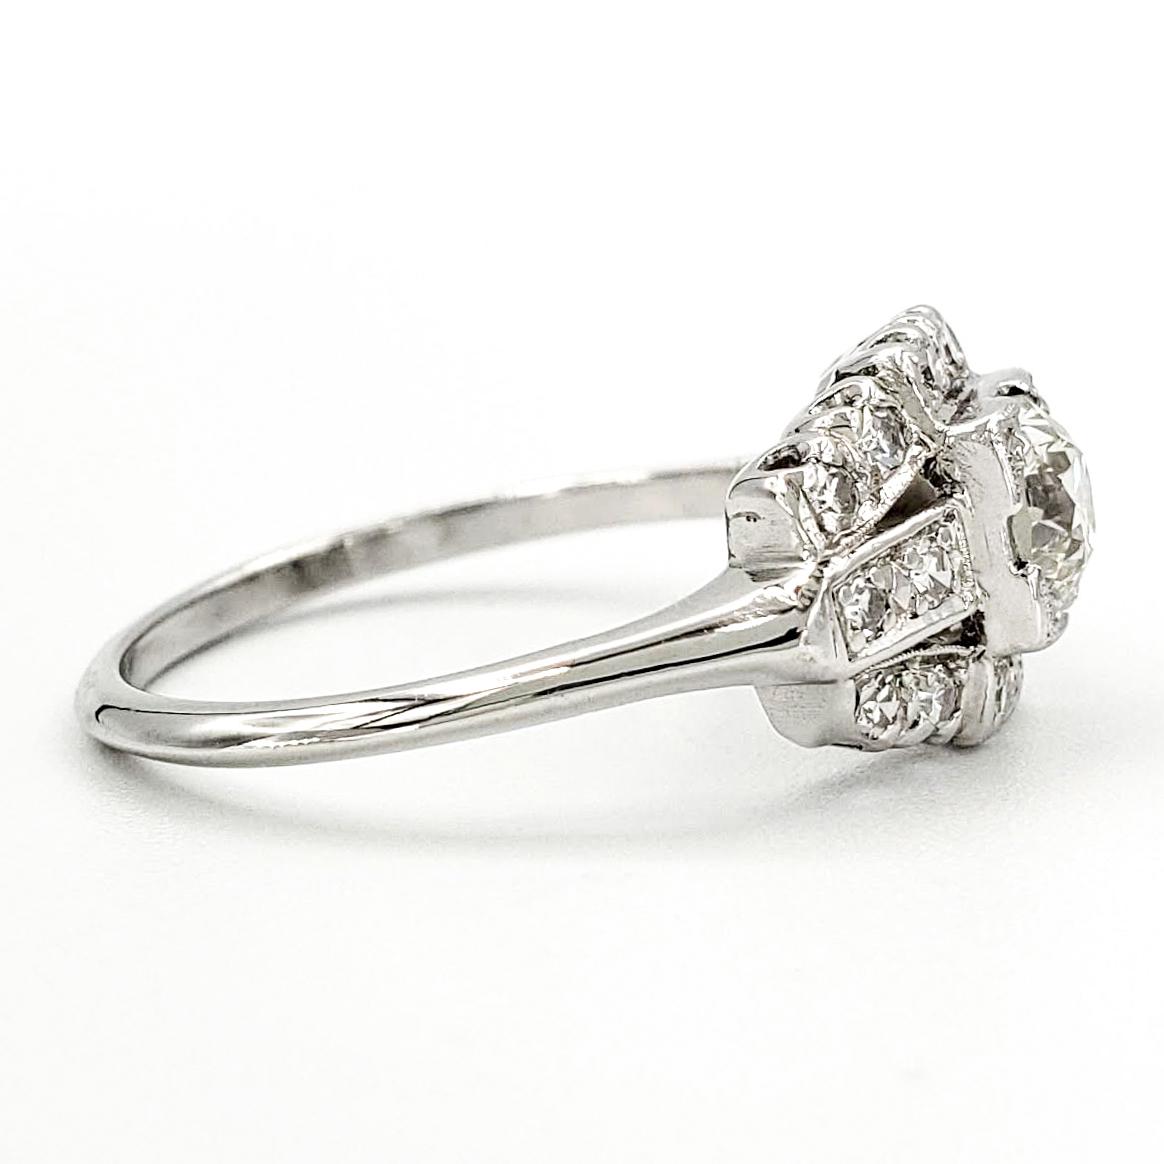 vintage-platinum-engagement-ring-with-0-55-carat-old-european-cut-diamond-egl-i-vs1